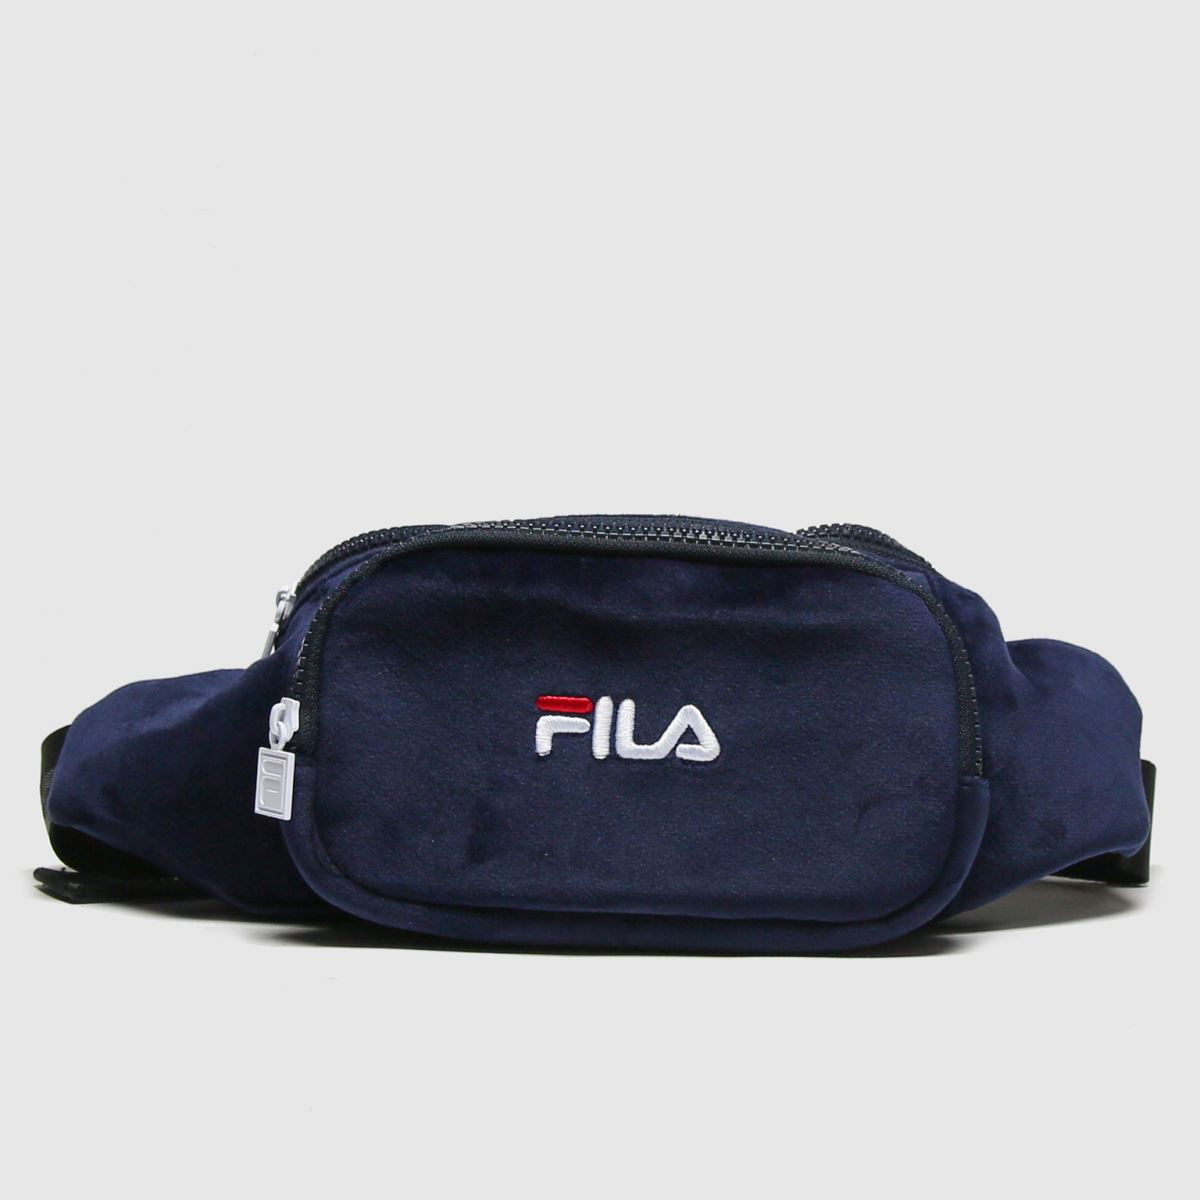 Accessories Fila Navy & White Fulbury Waistbag